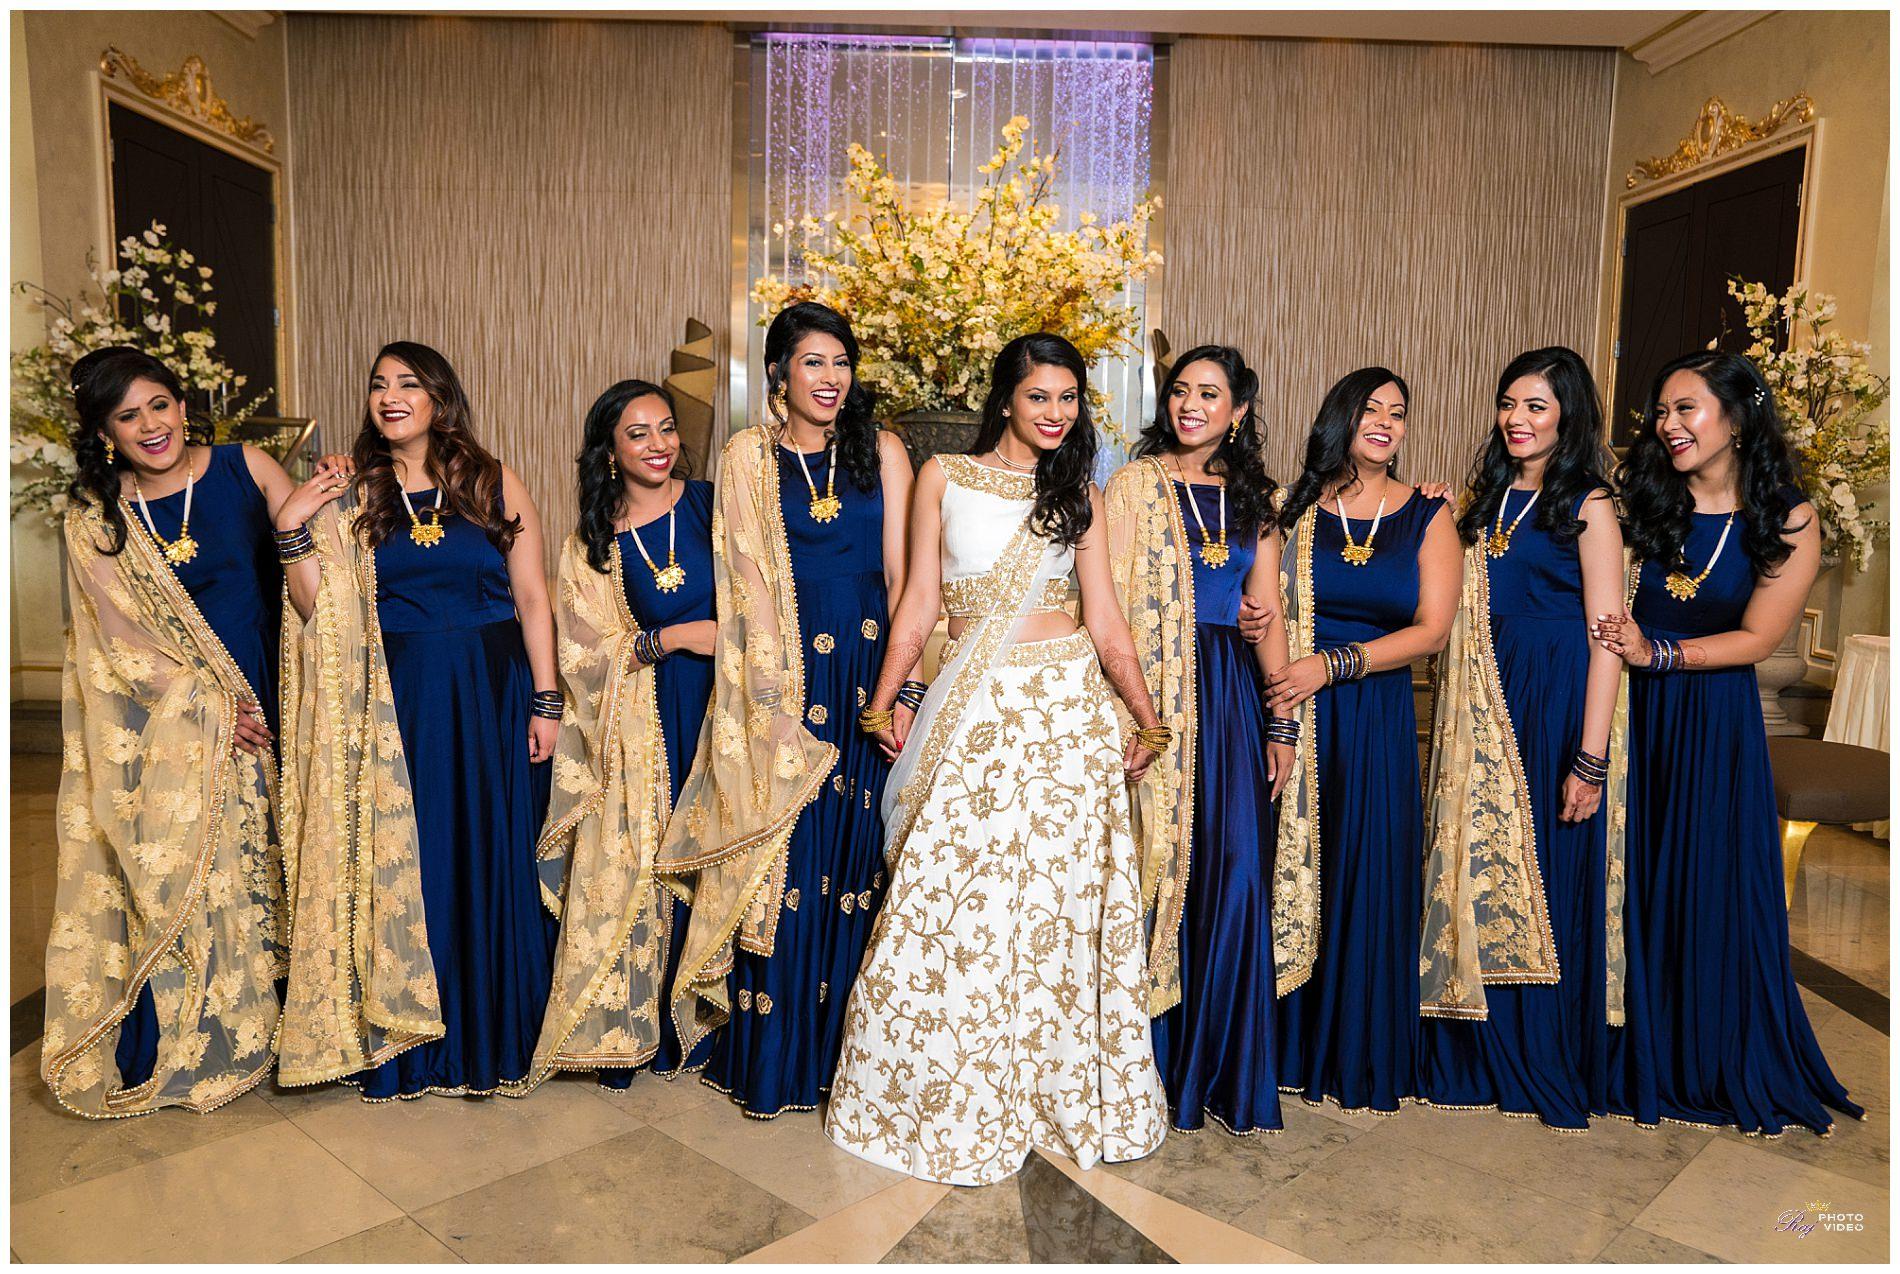 Royal-Manor-Garfield-NJ-Christian-Wedding-Ceremony-Khusbu-Jeff-29.jpg